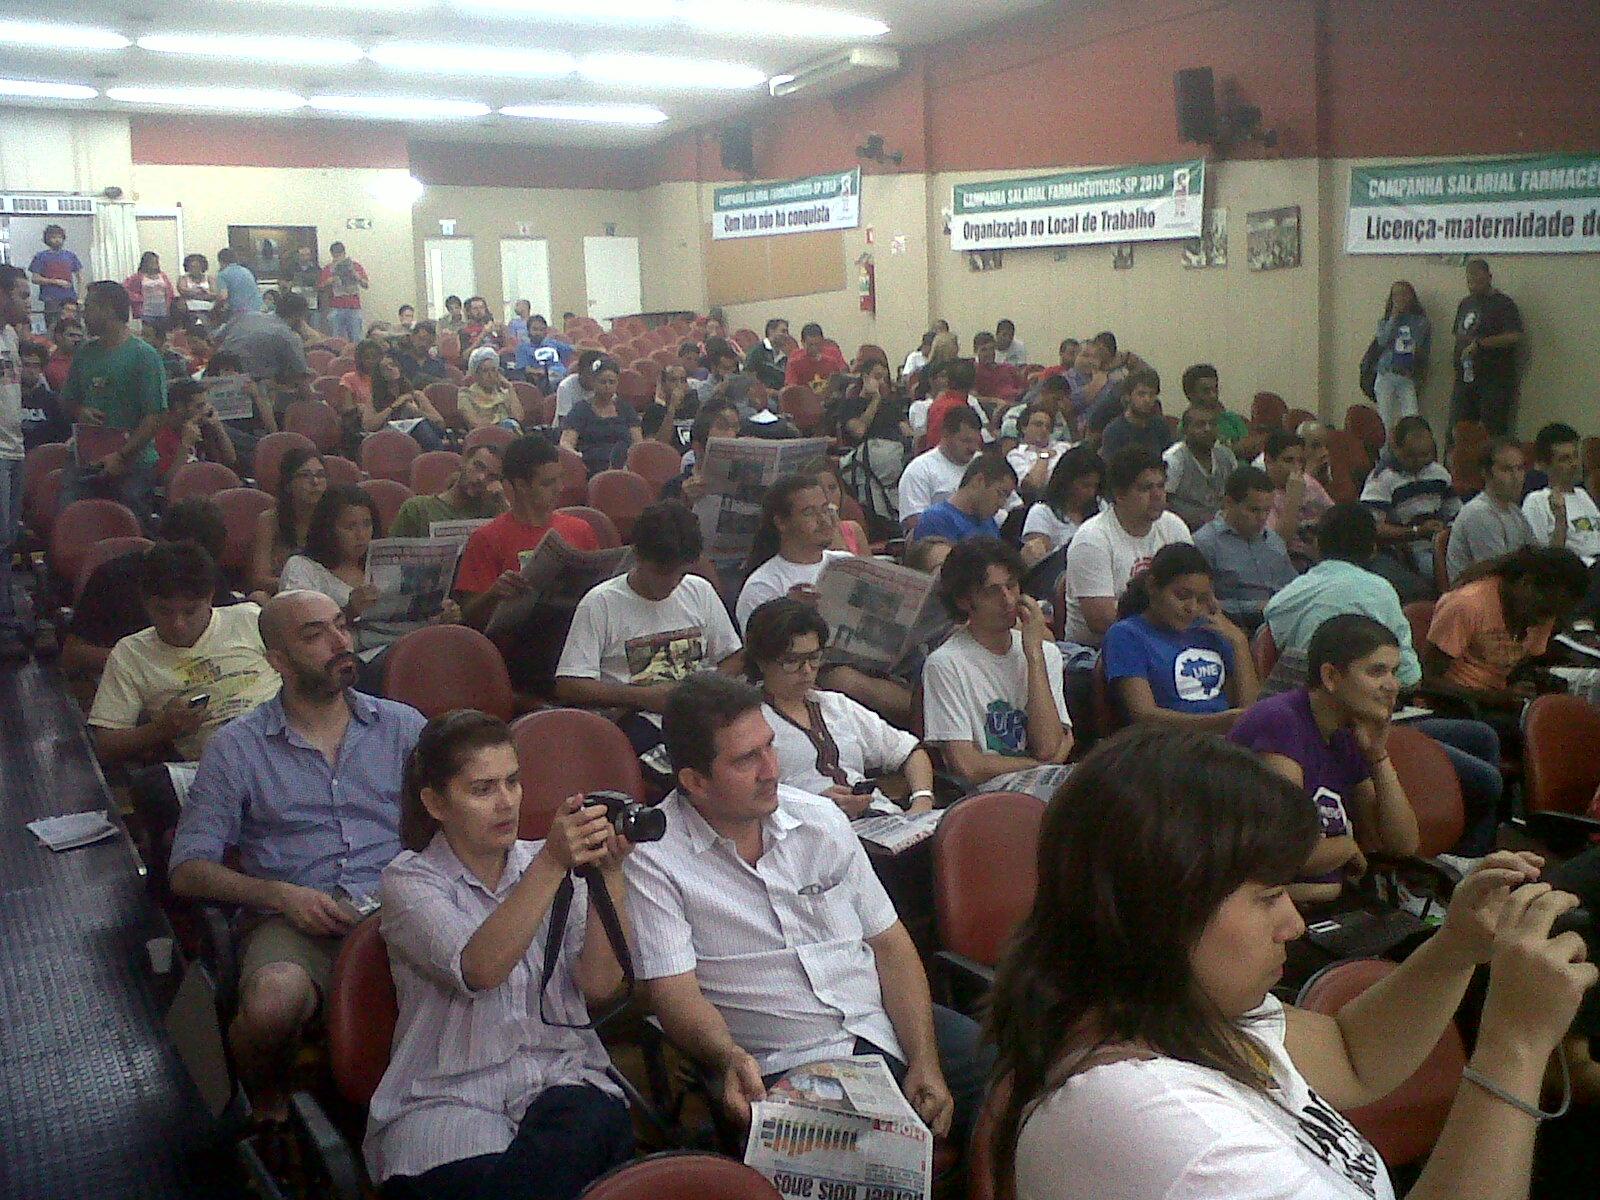 plenaria juventude plateia